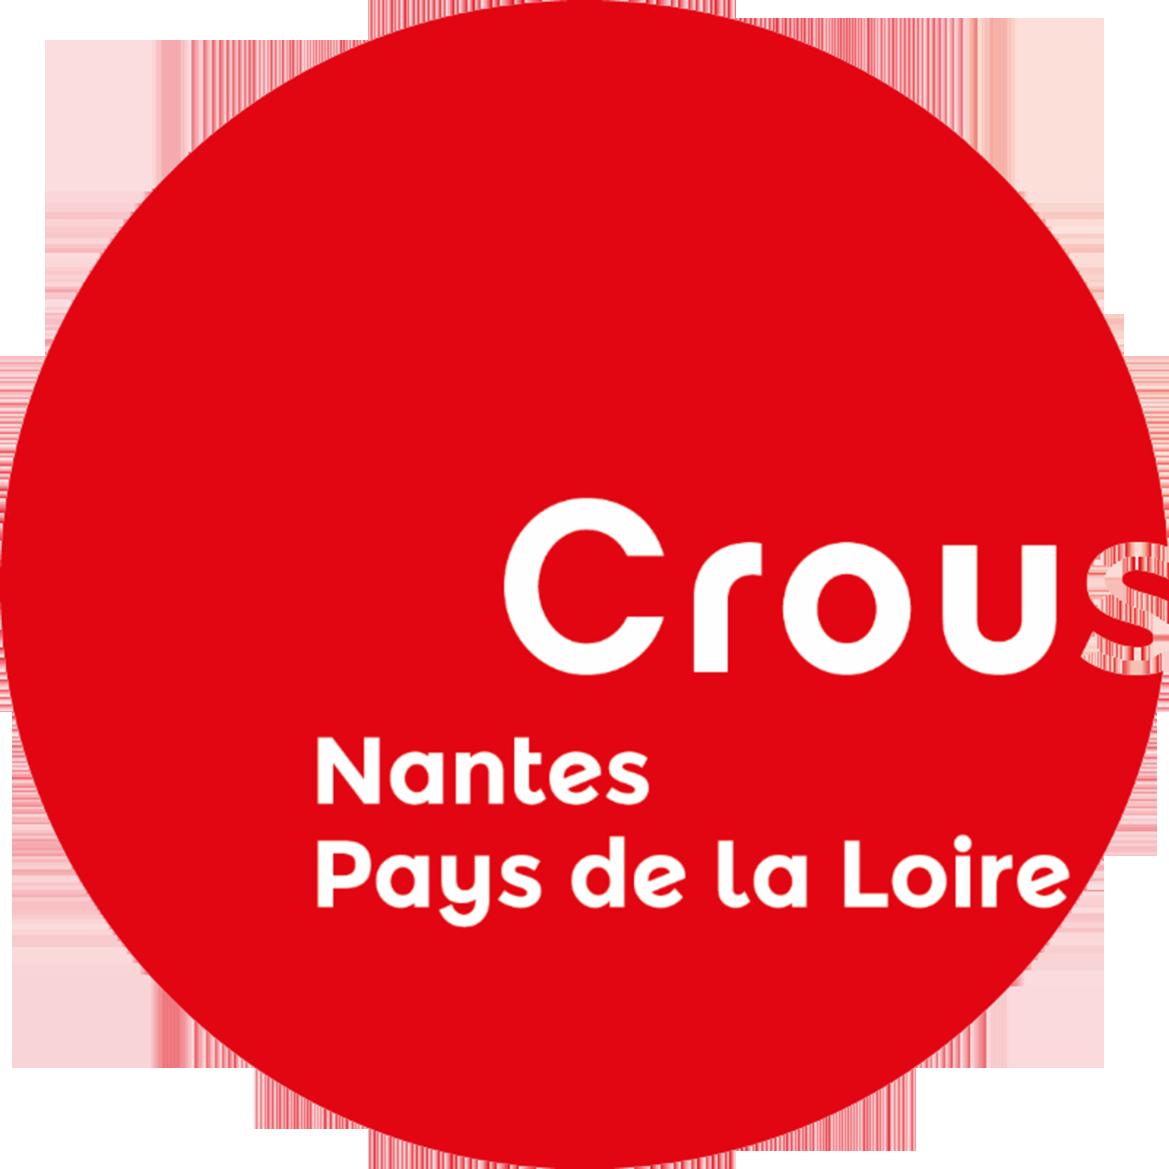 LOGO - CROUS